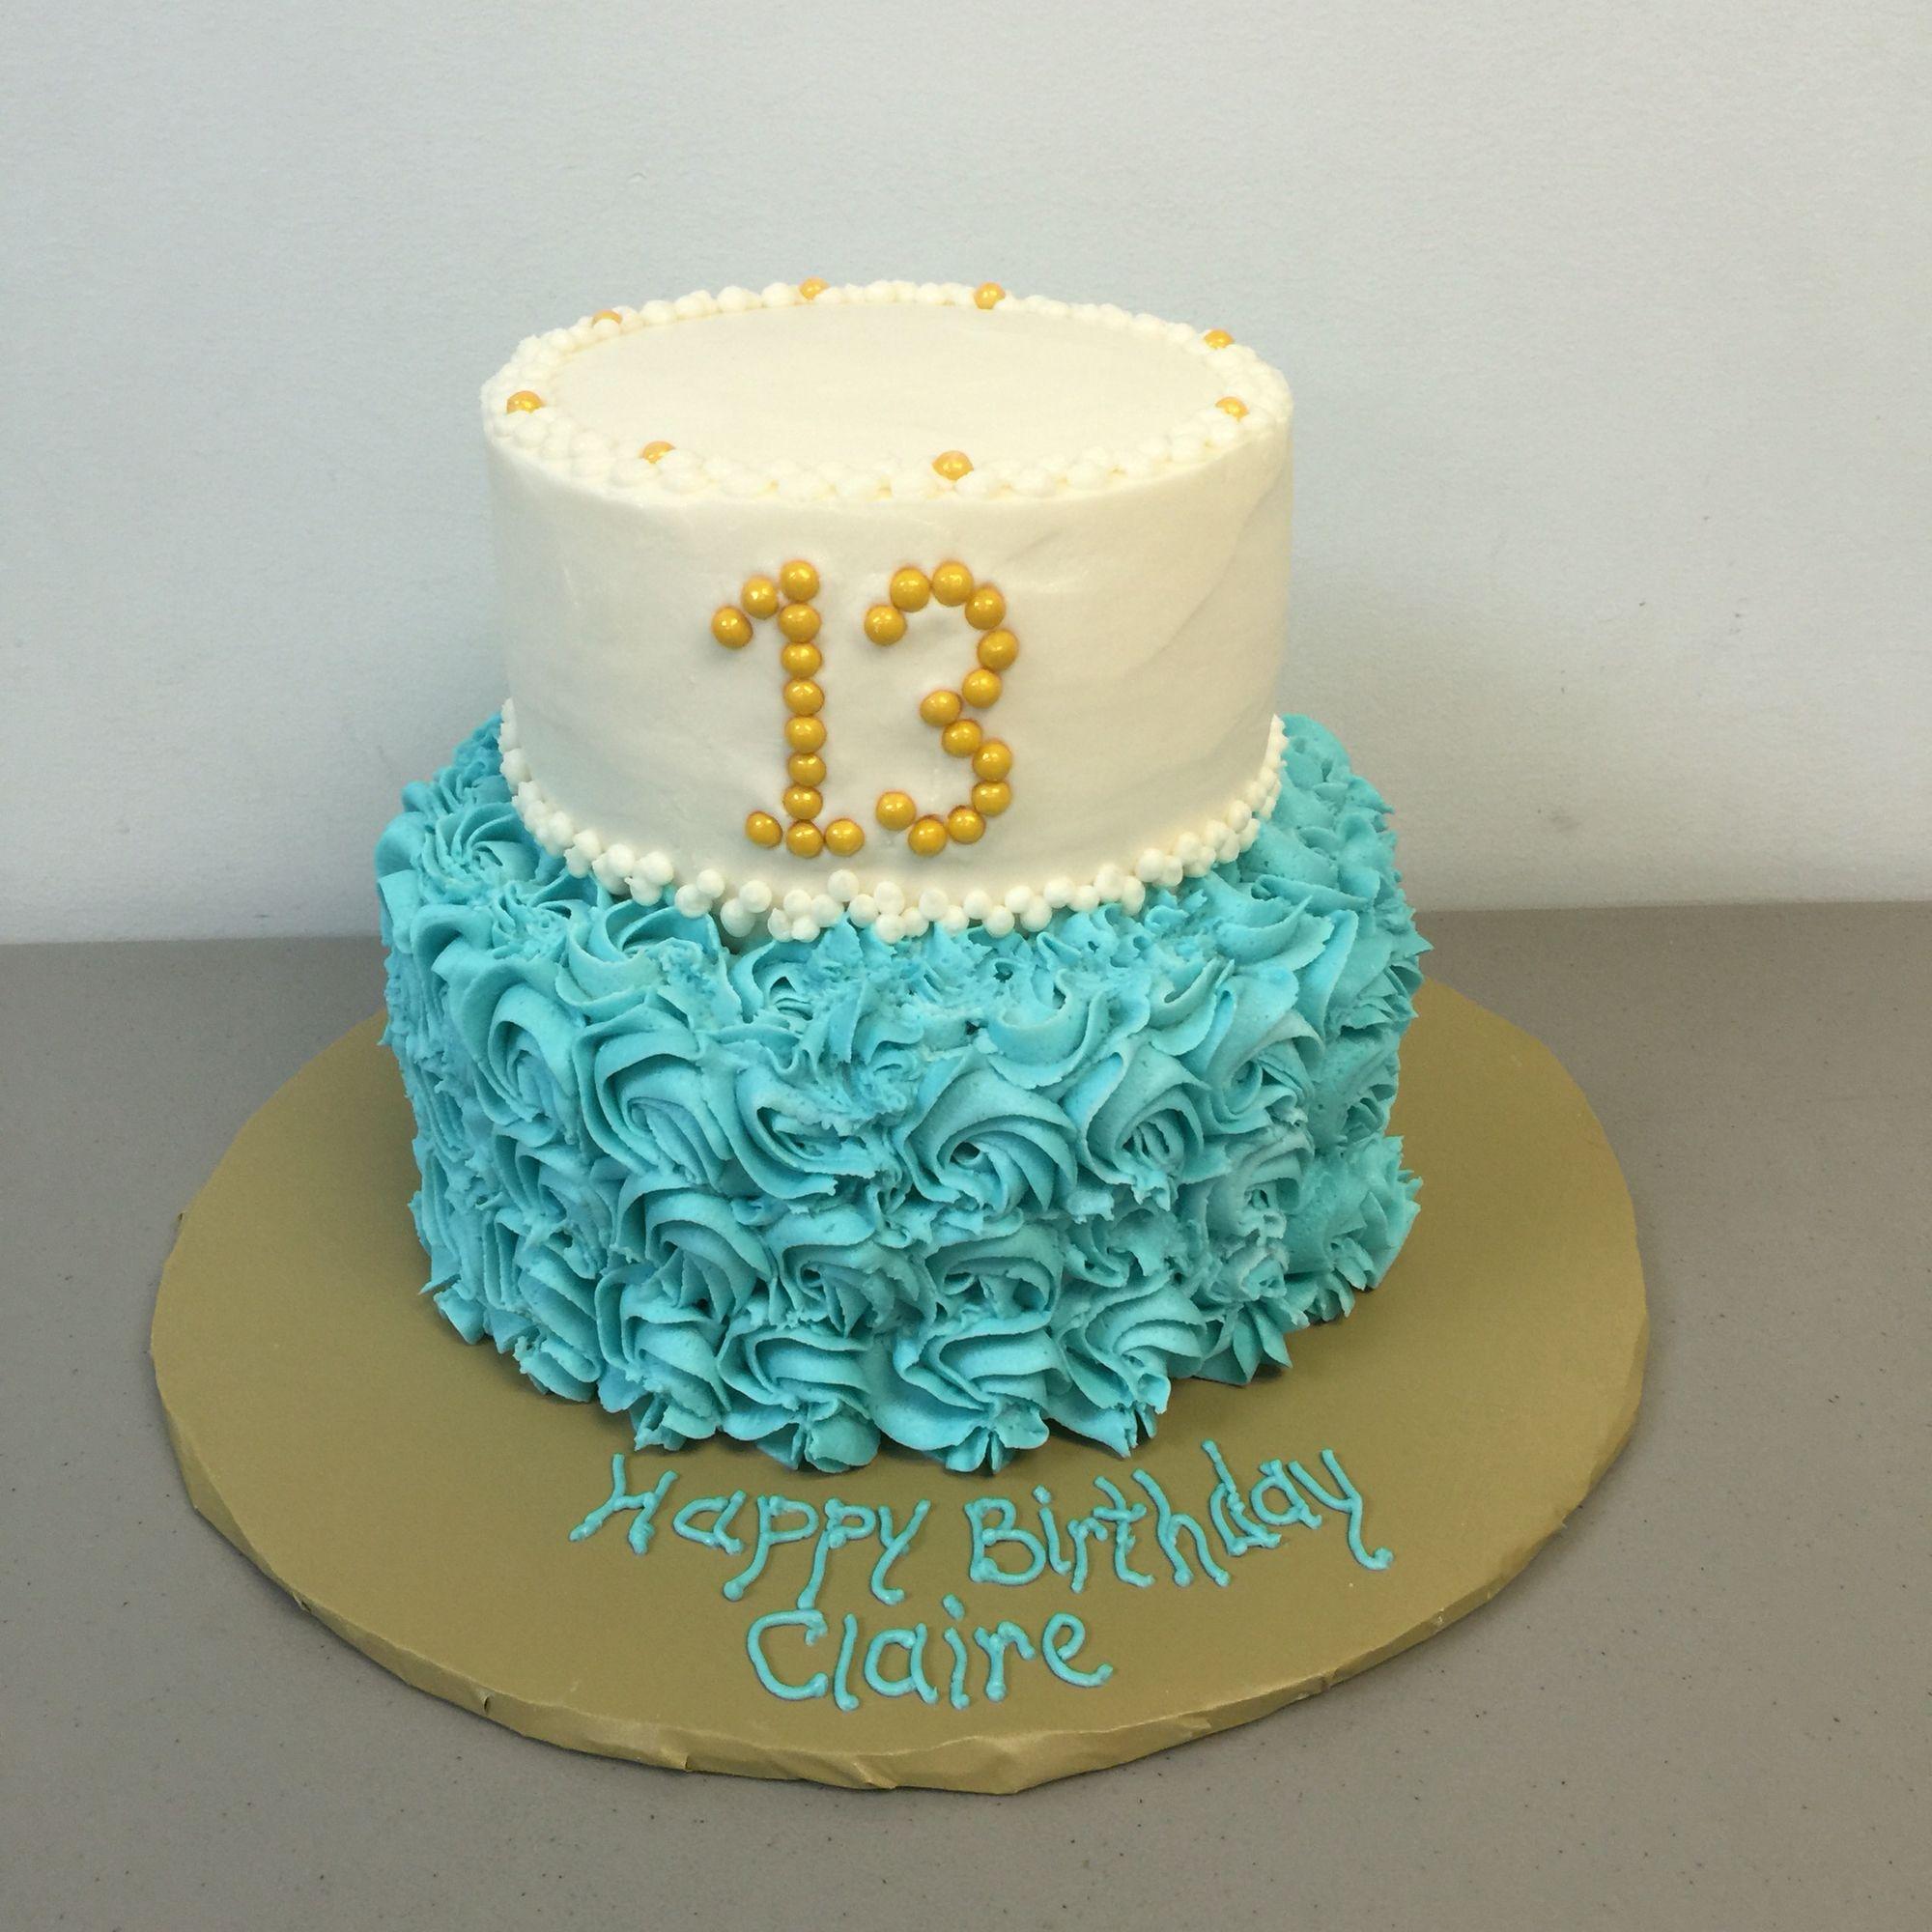 13 Year Old Birthday Cake